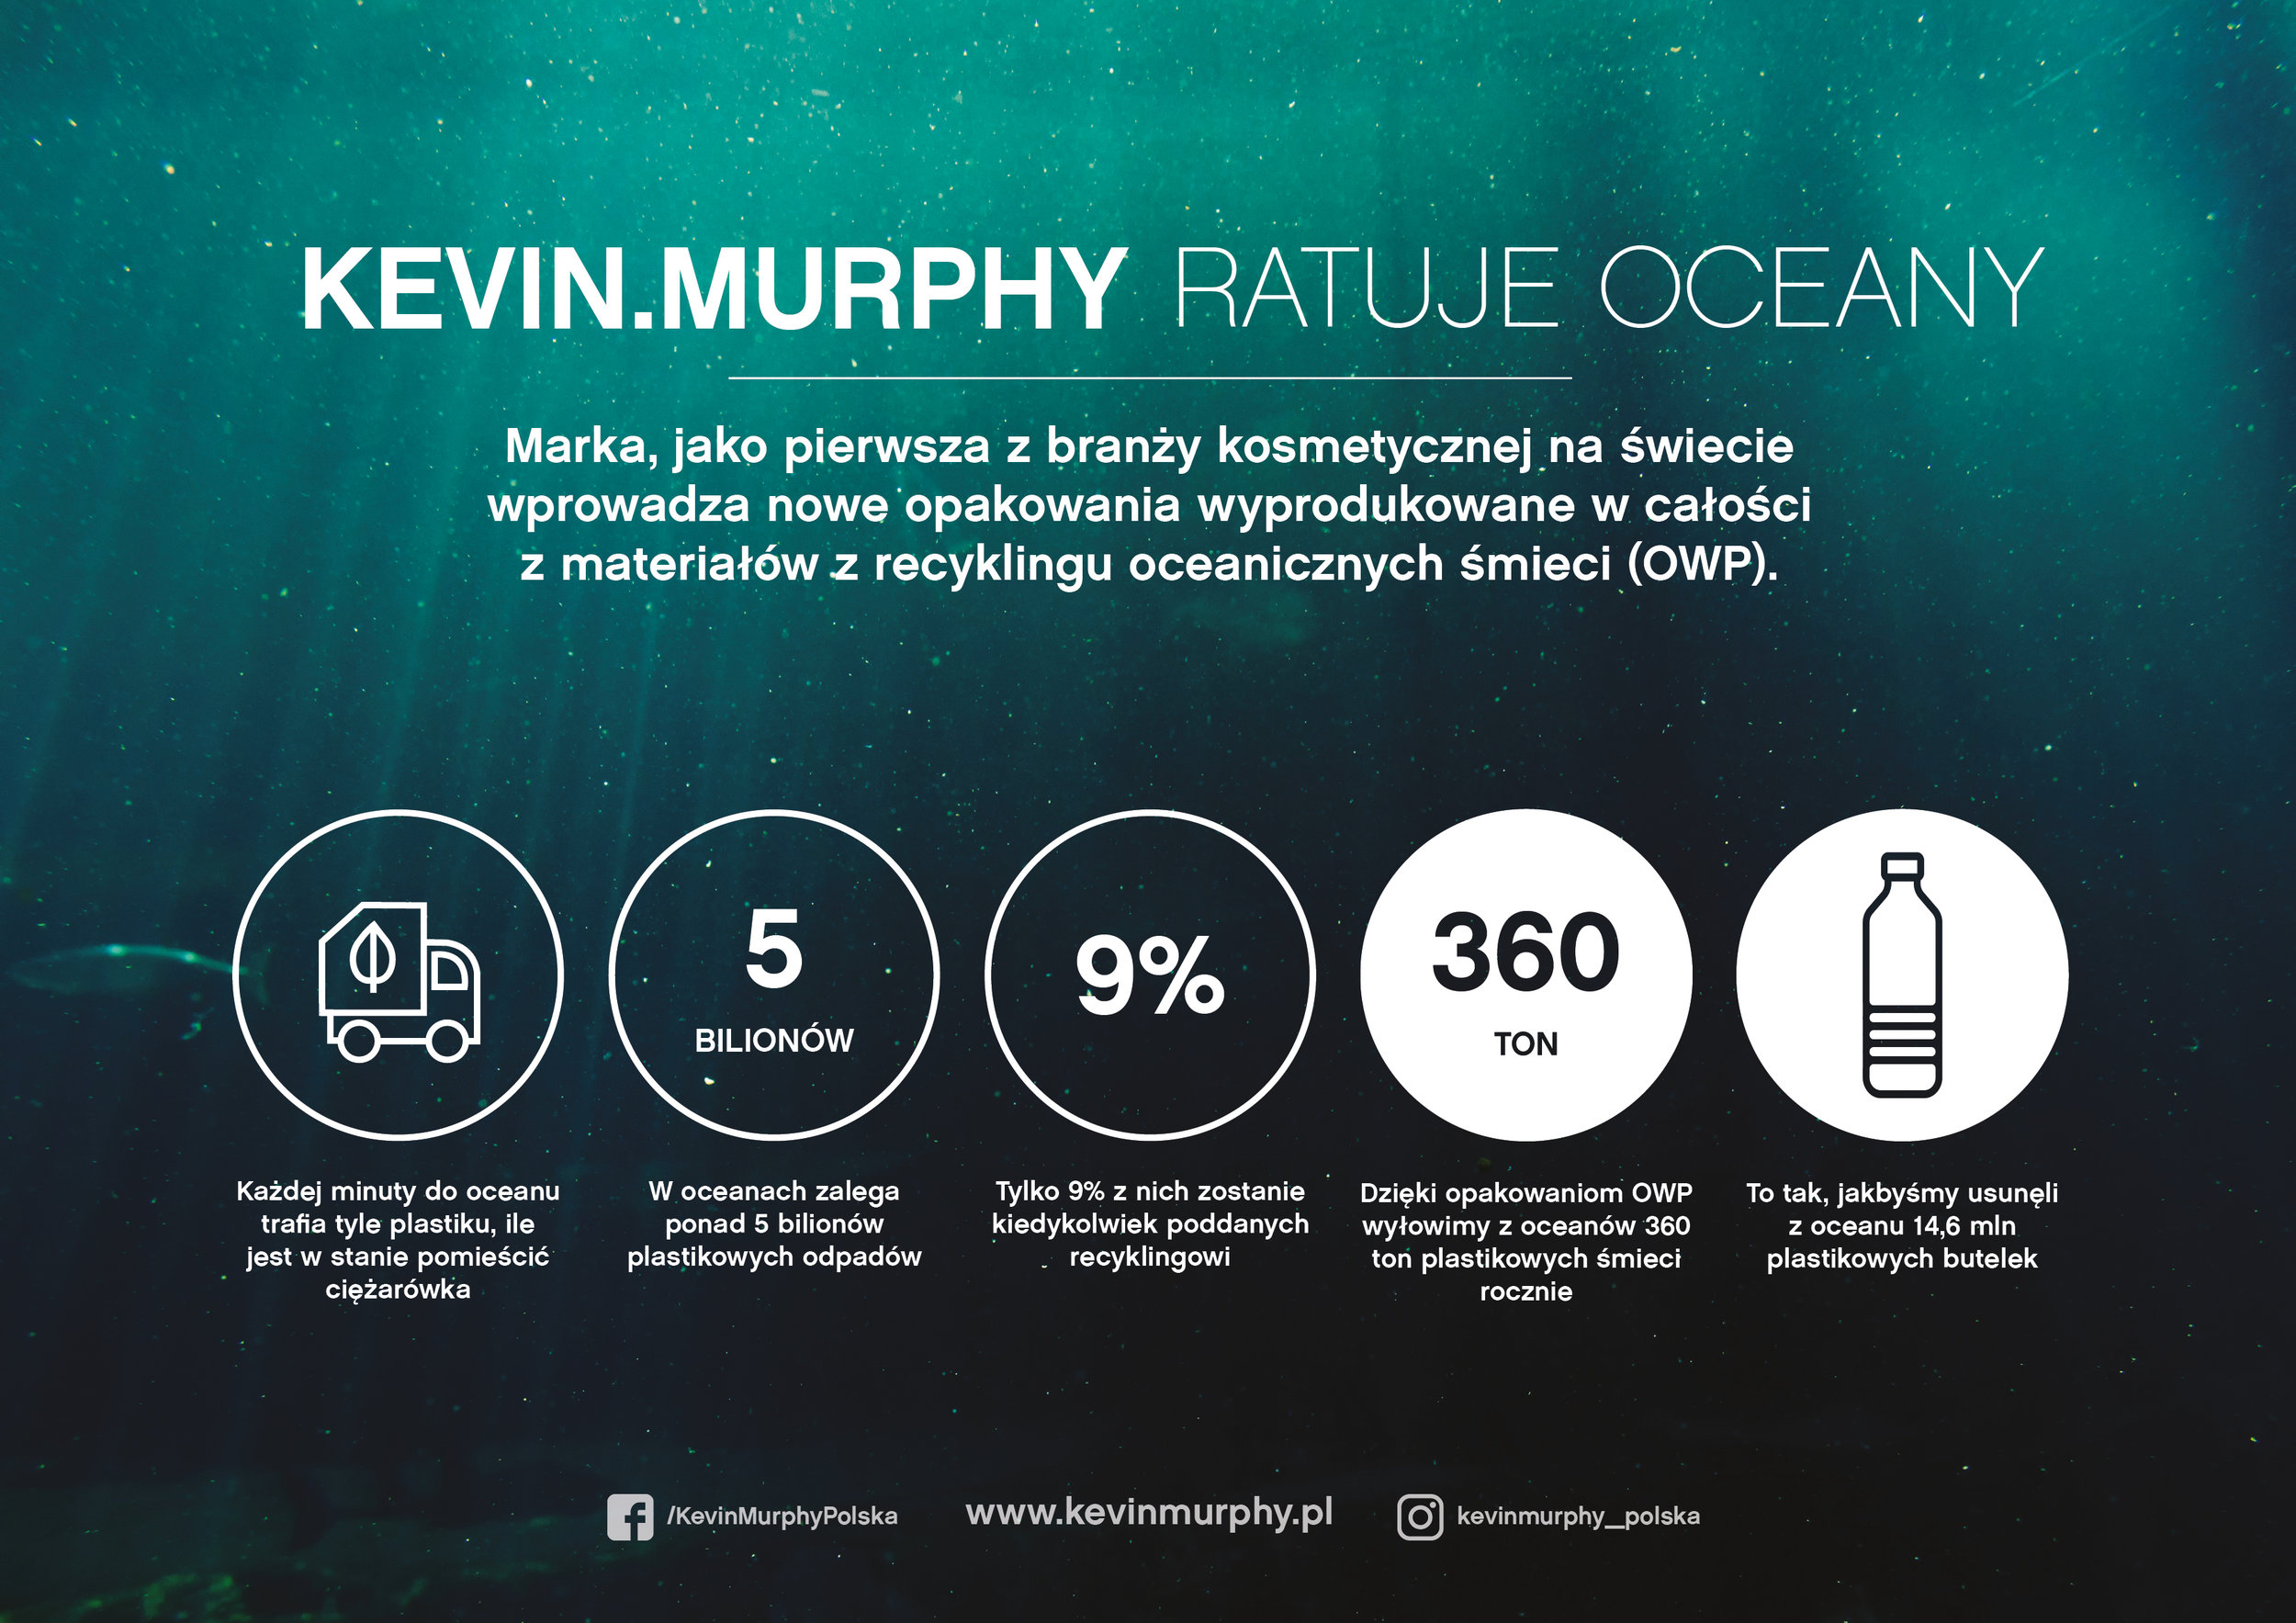 Ocean Waste Plastic_2_300dpi.jpg